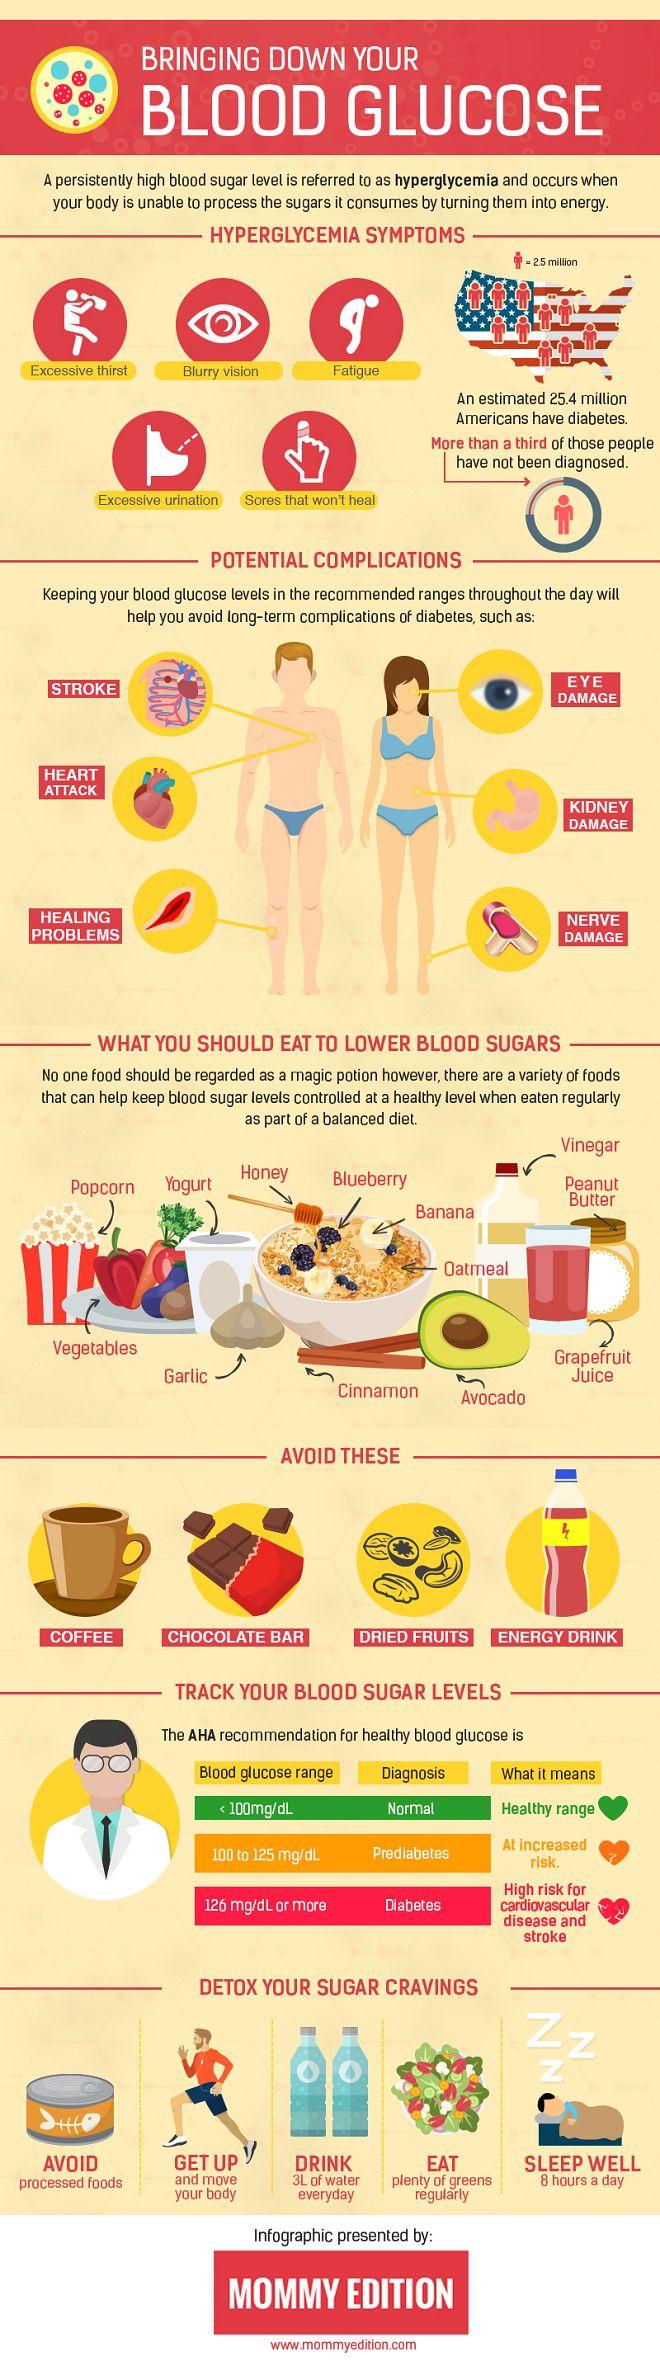 Lowering Blood Glucose